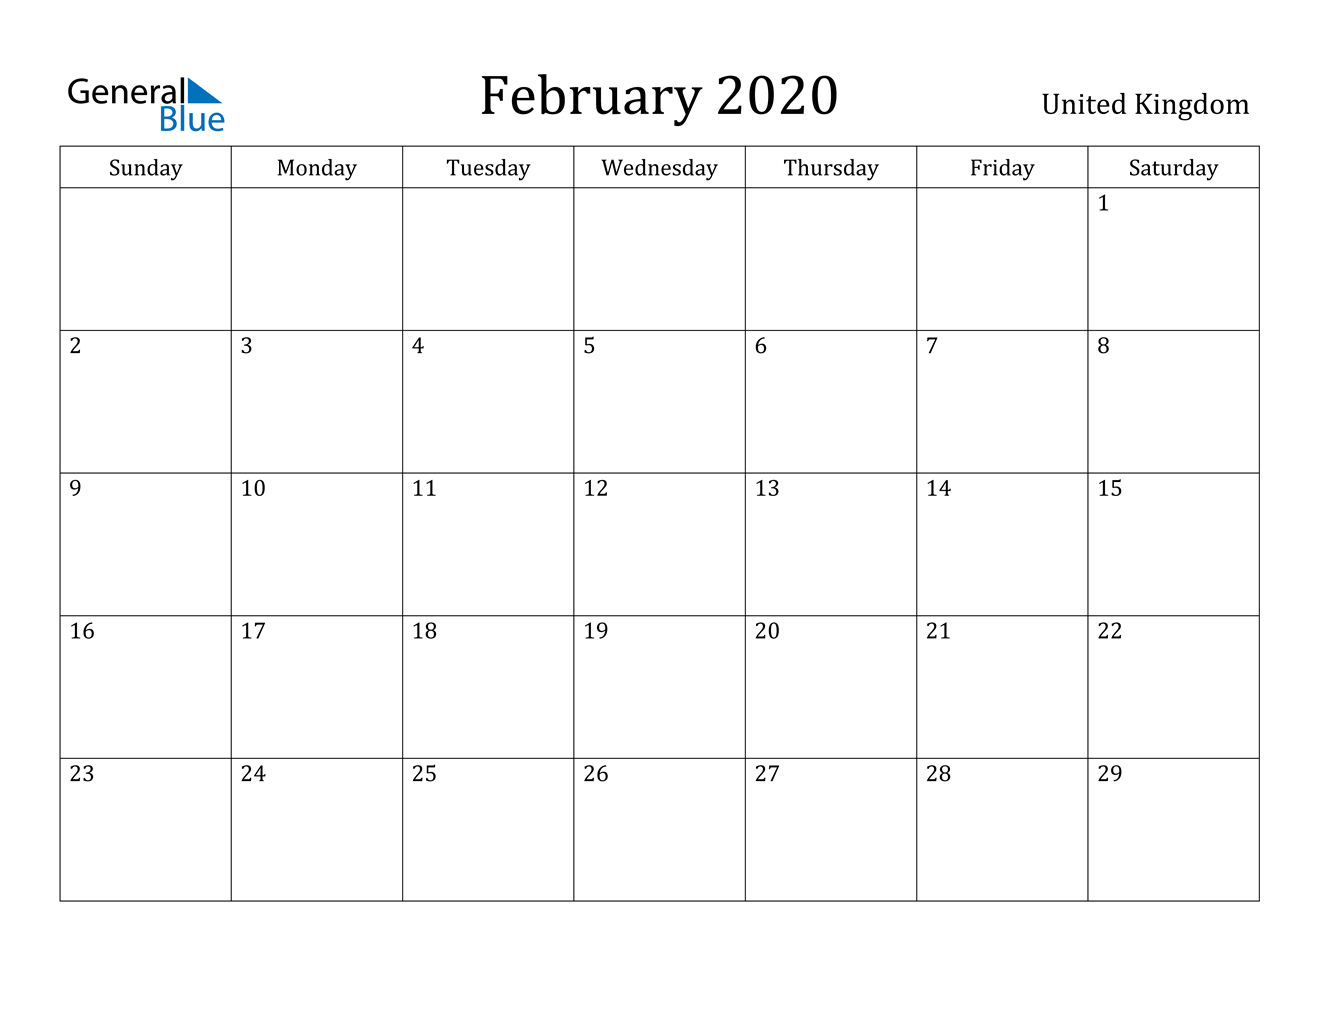 Image of February 2020 United Kingdom Calendar with Holidays Calendar